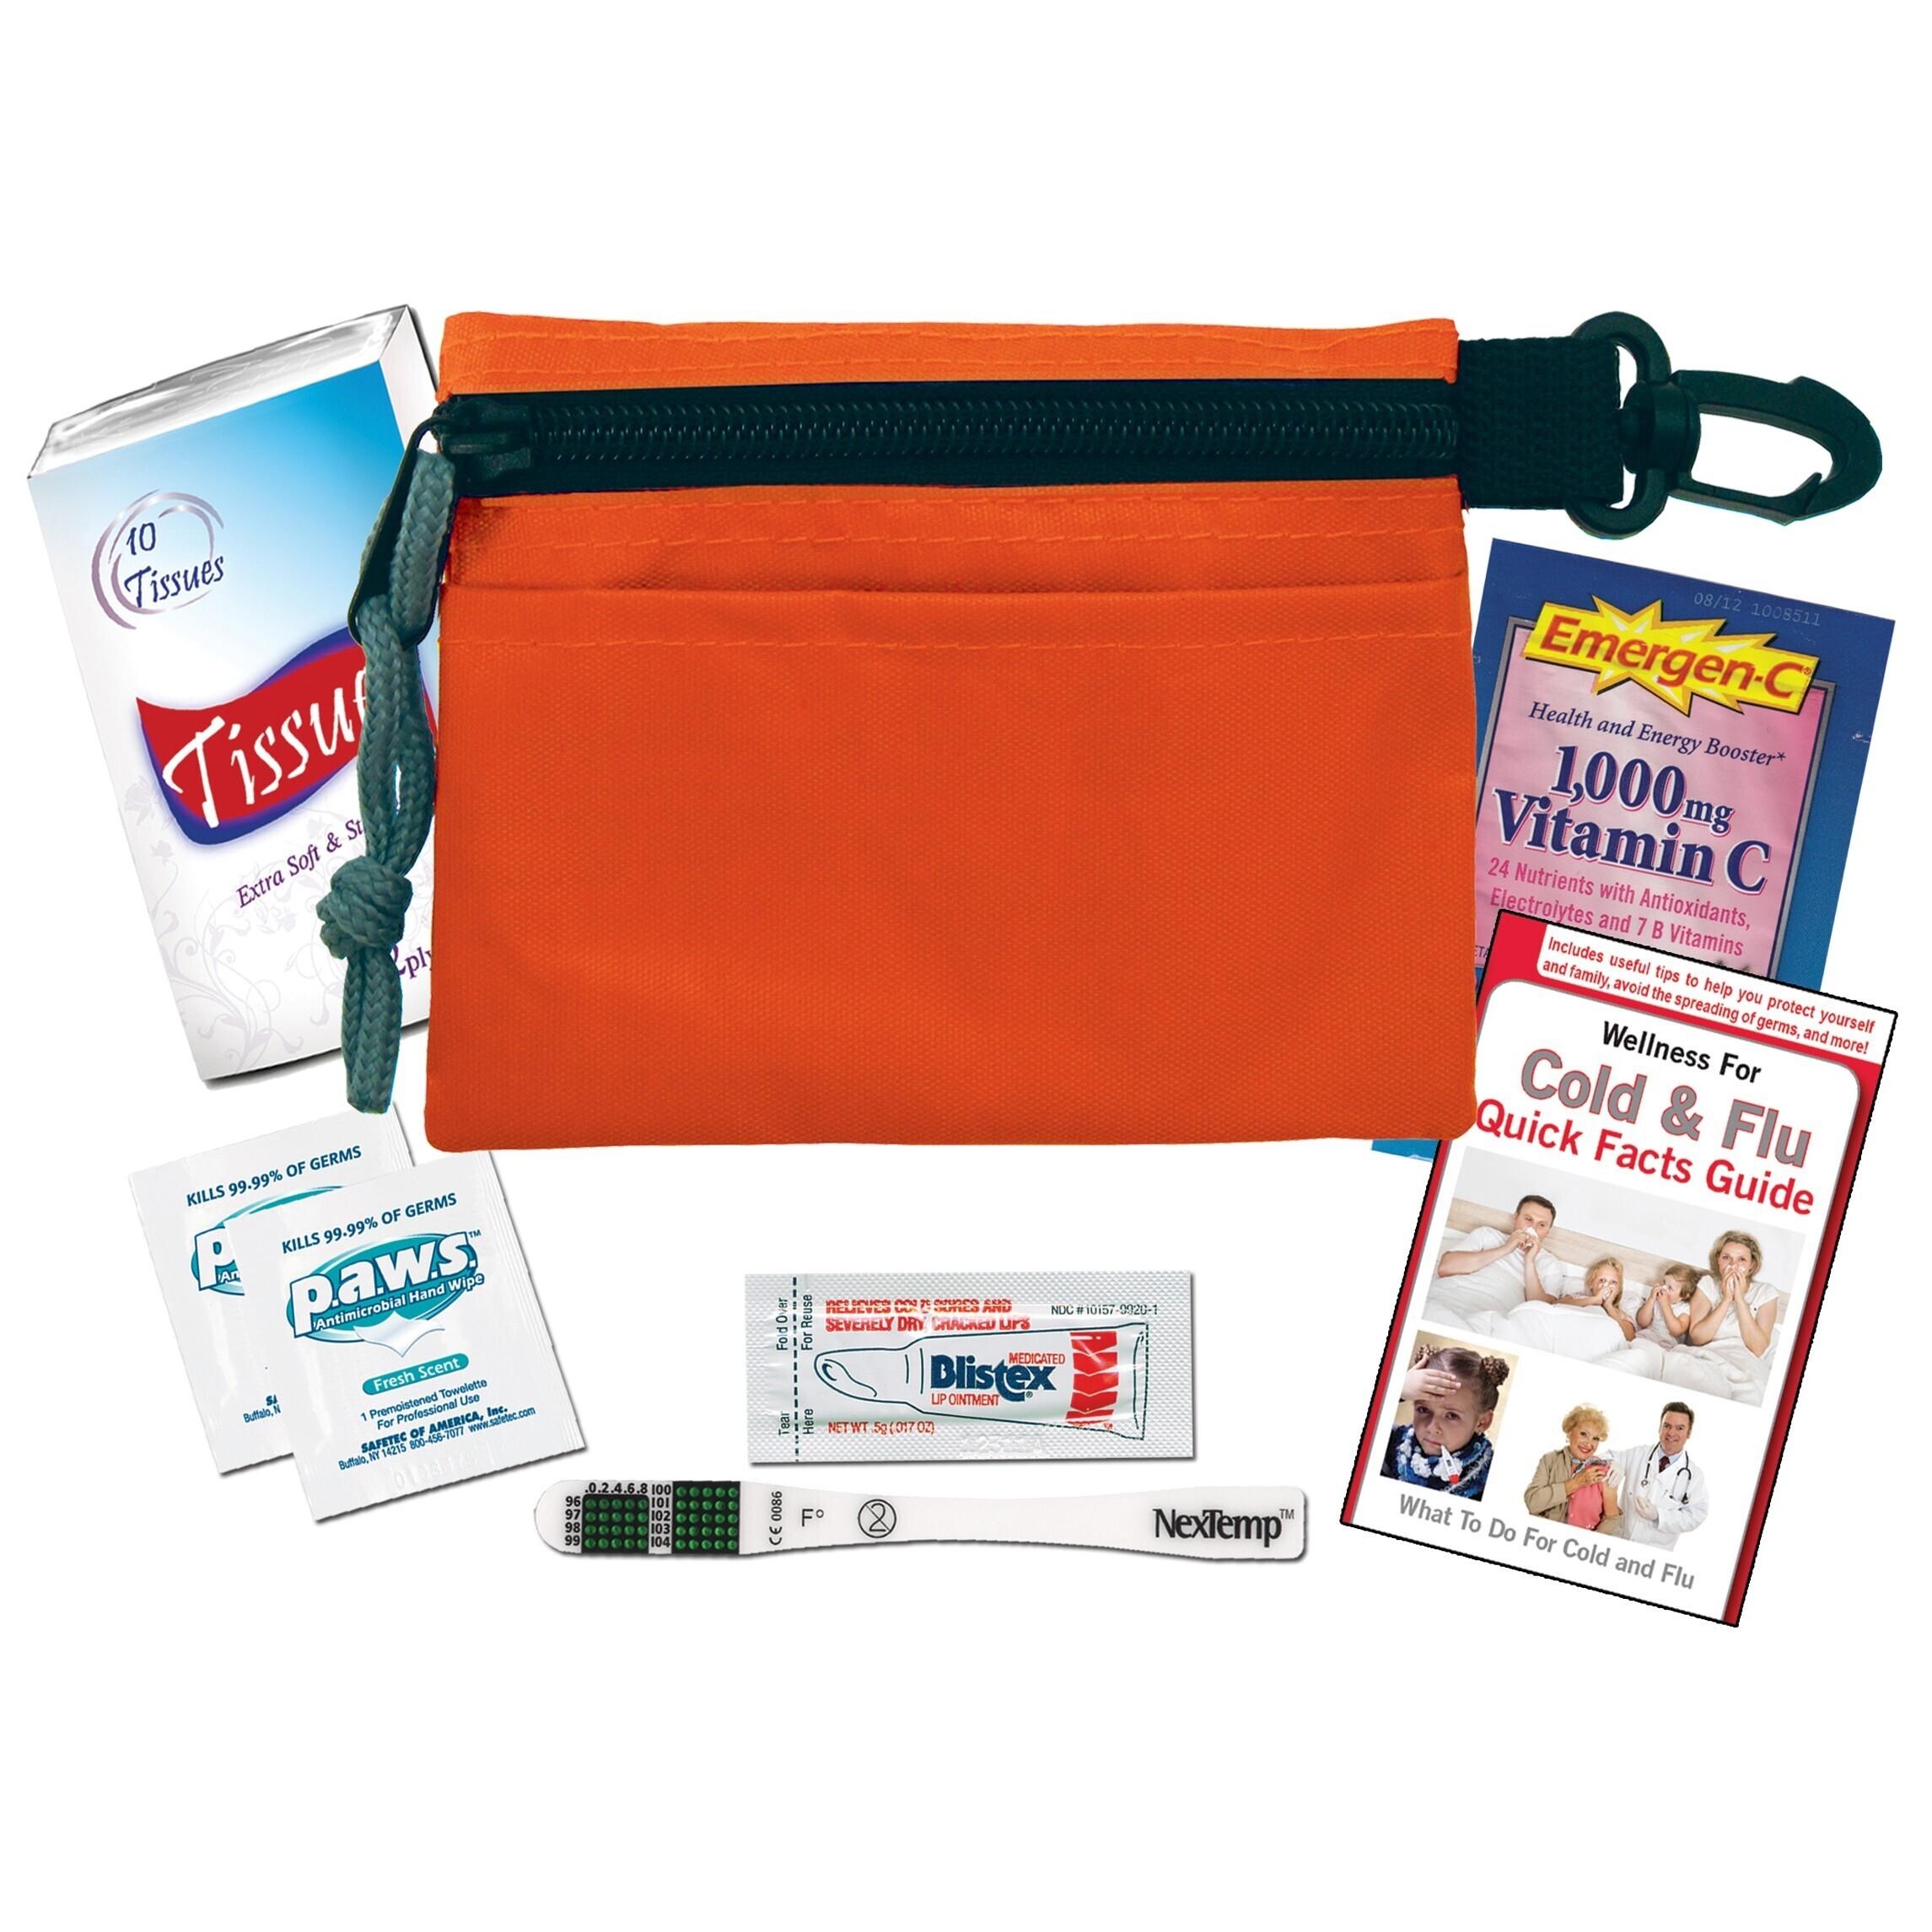 Compact Health & Wellness Kit